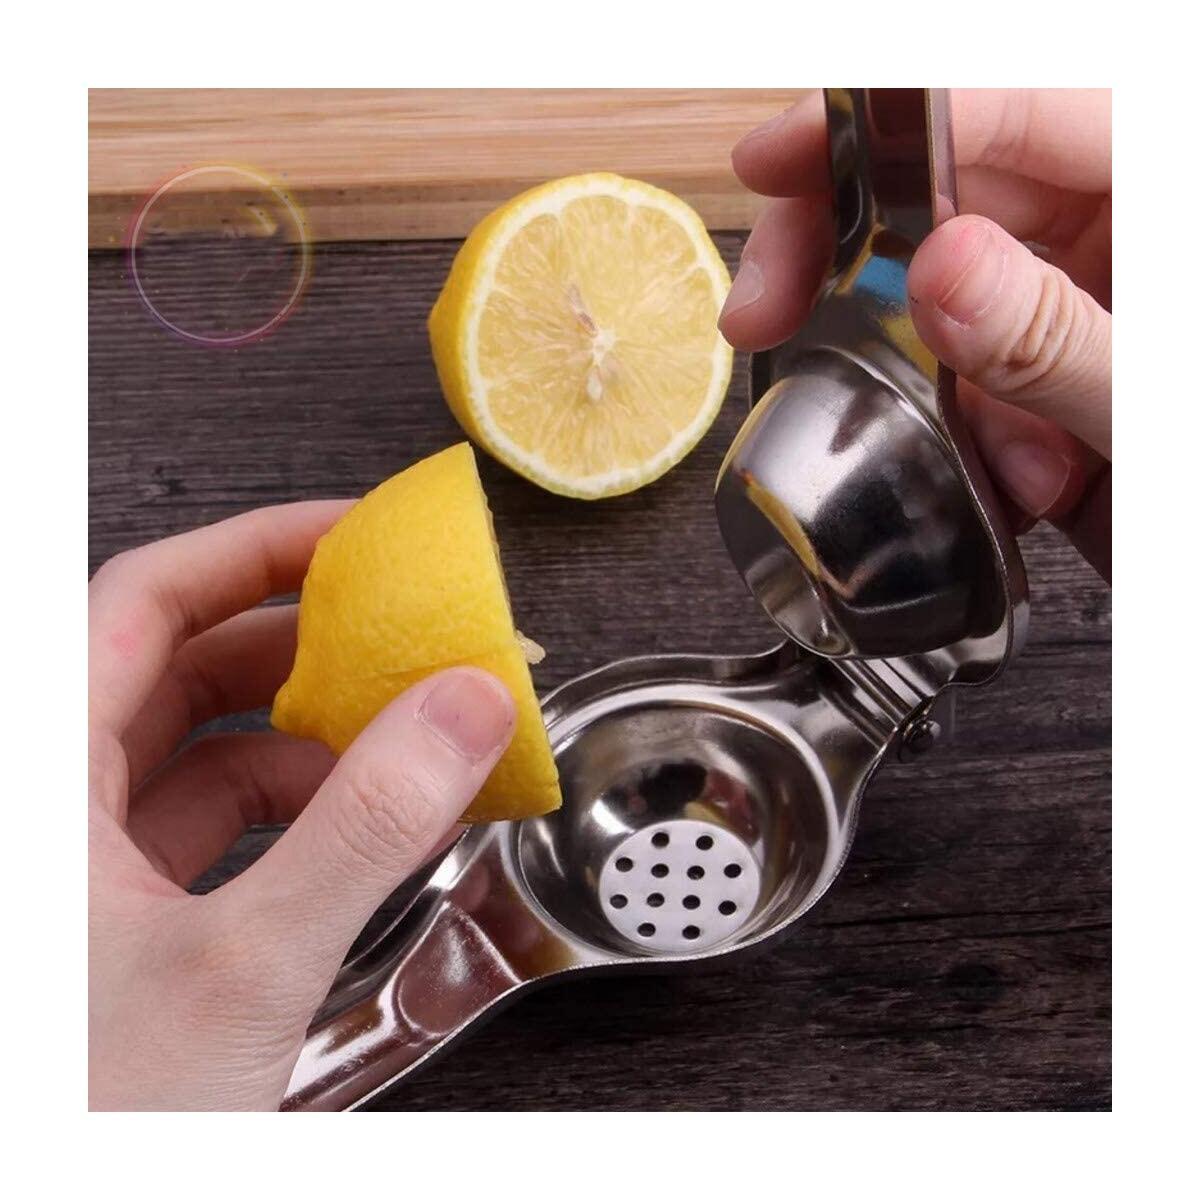 Stainless steel premium quality lemon squeezer manual fruit juicer hand press